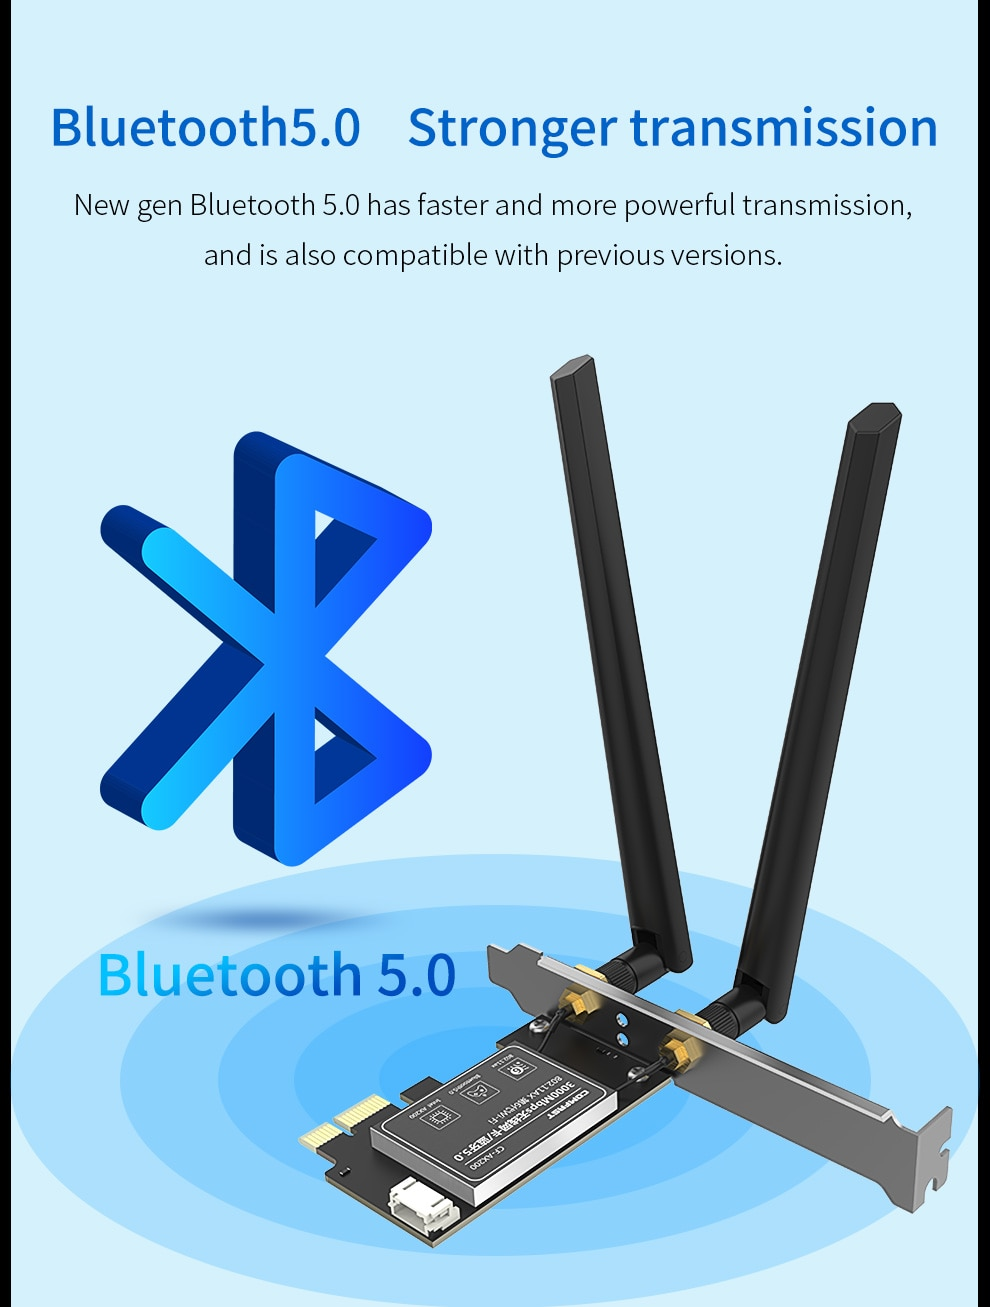 Banda Dual 2400Mbps Wifi 6 AX200NGW PCI-E 1X adaptador inalámbrico 2,4G/5Ghz 802.11ac/ax Bluetooth 5,0 para tarjeta de red AX200 WIFI